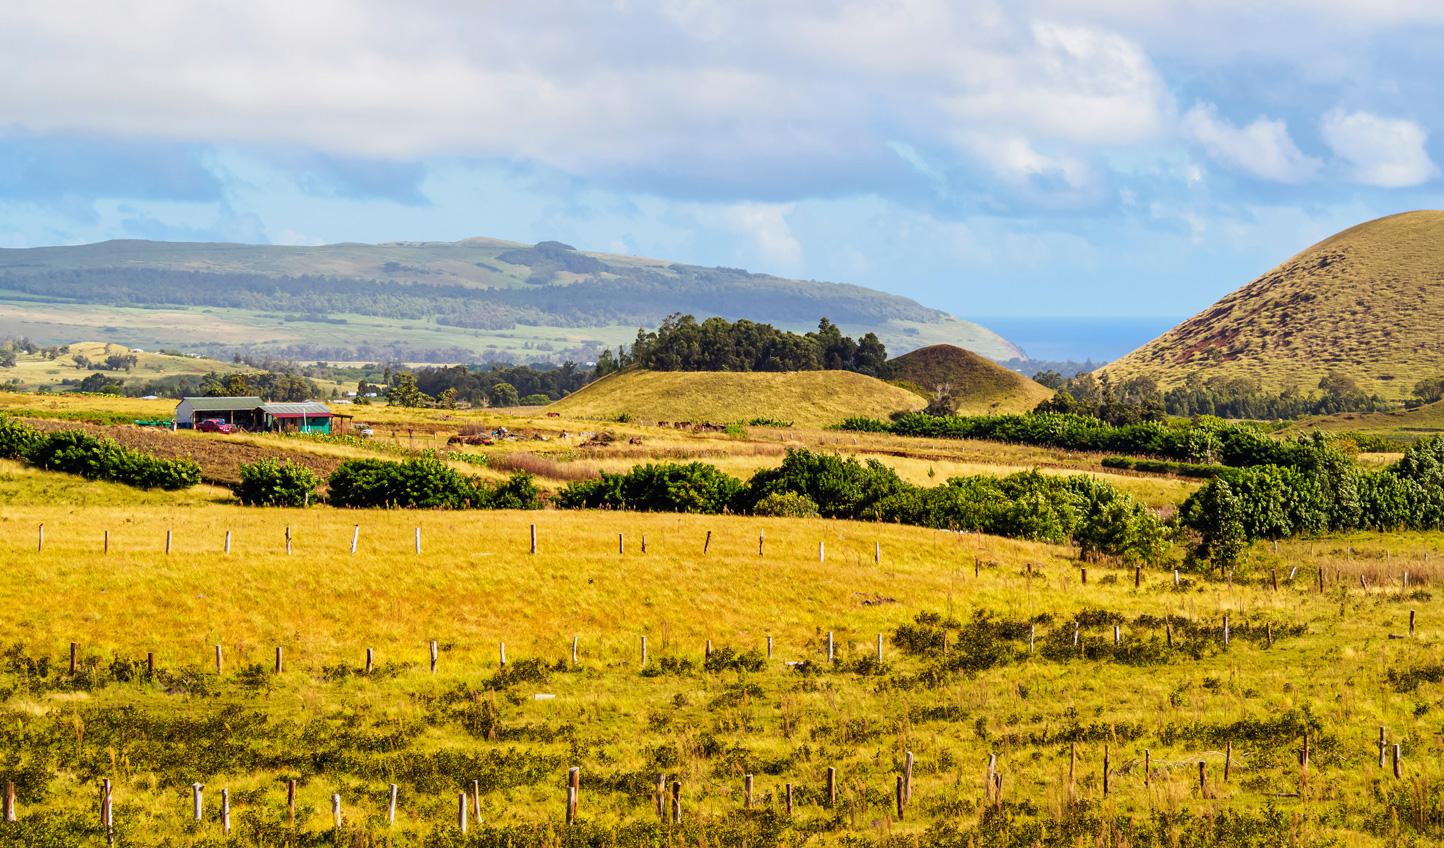 Move on to Easter Island and climb up Maunga Terevaka